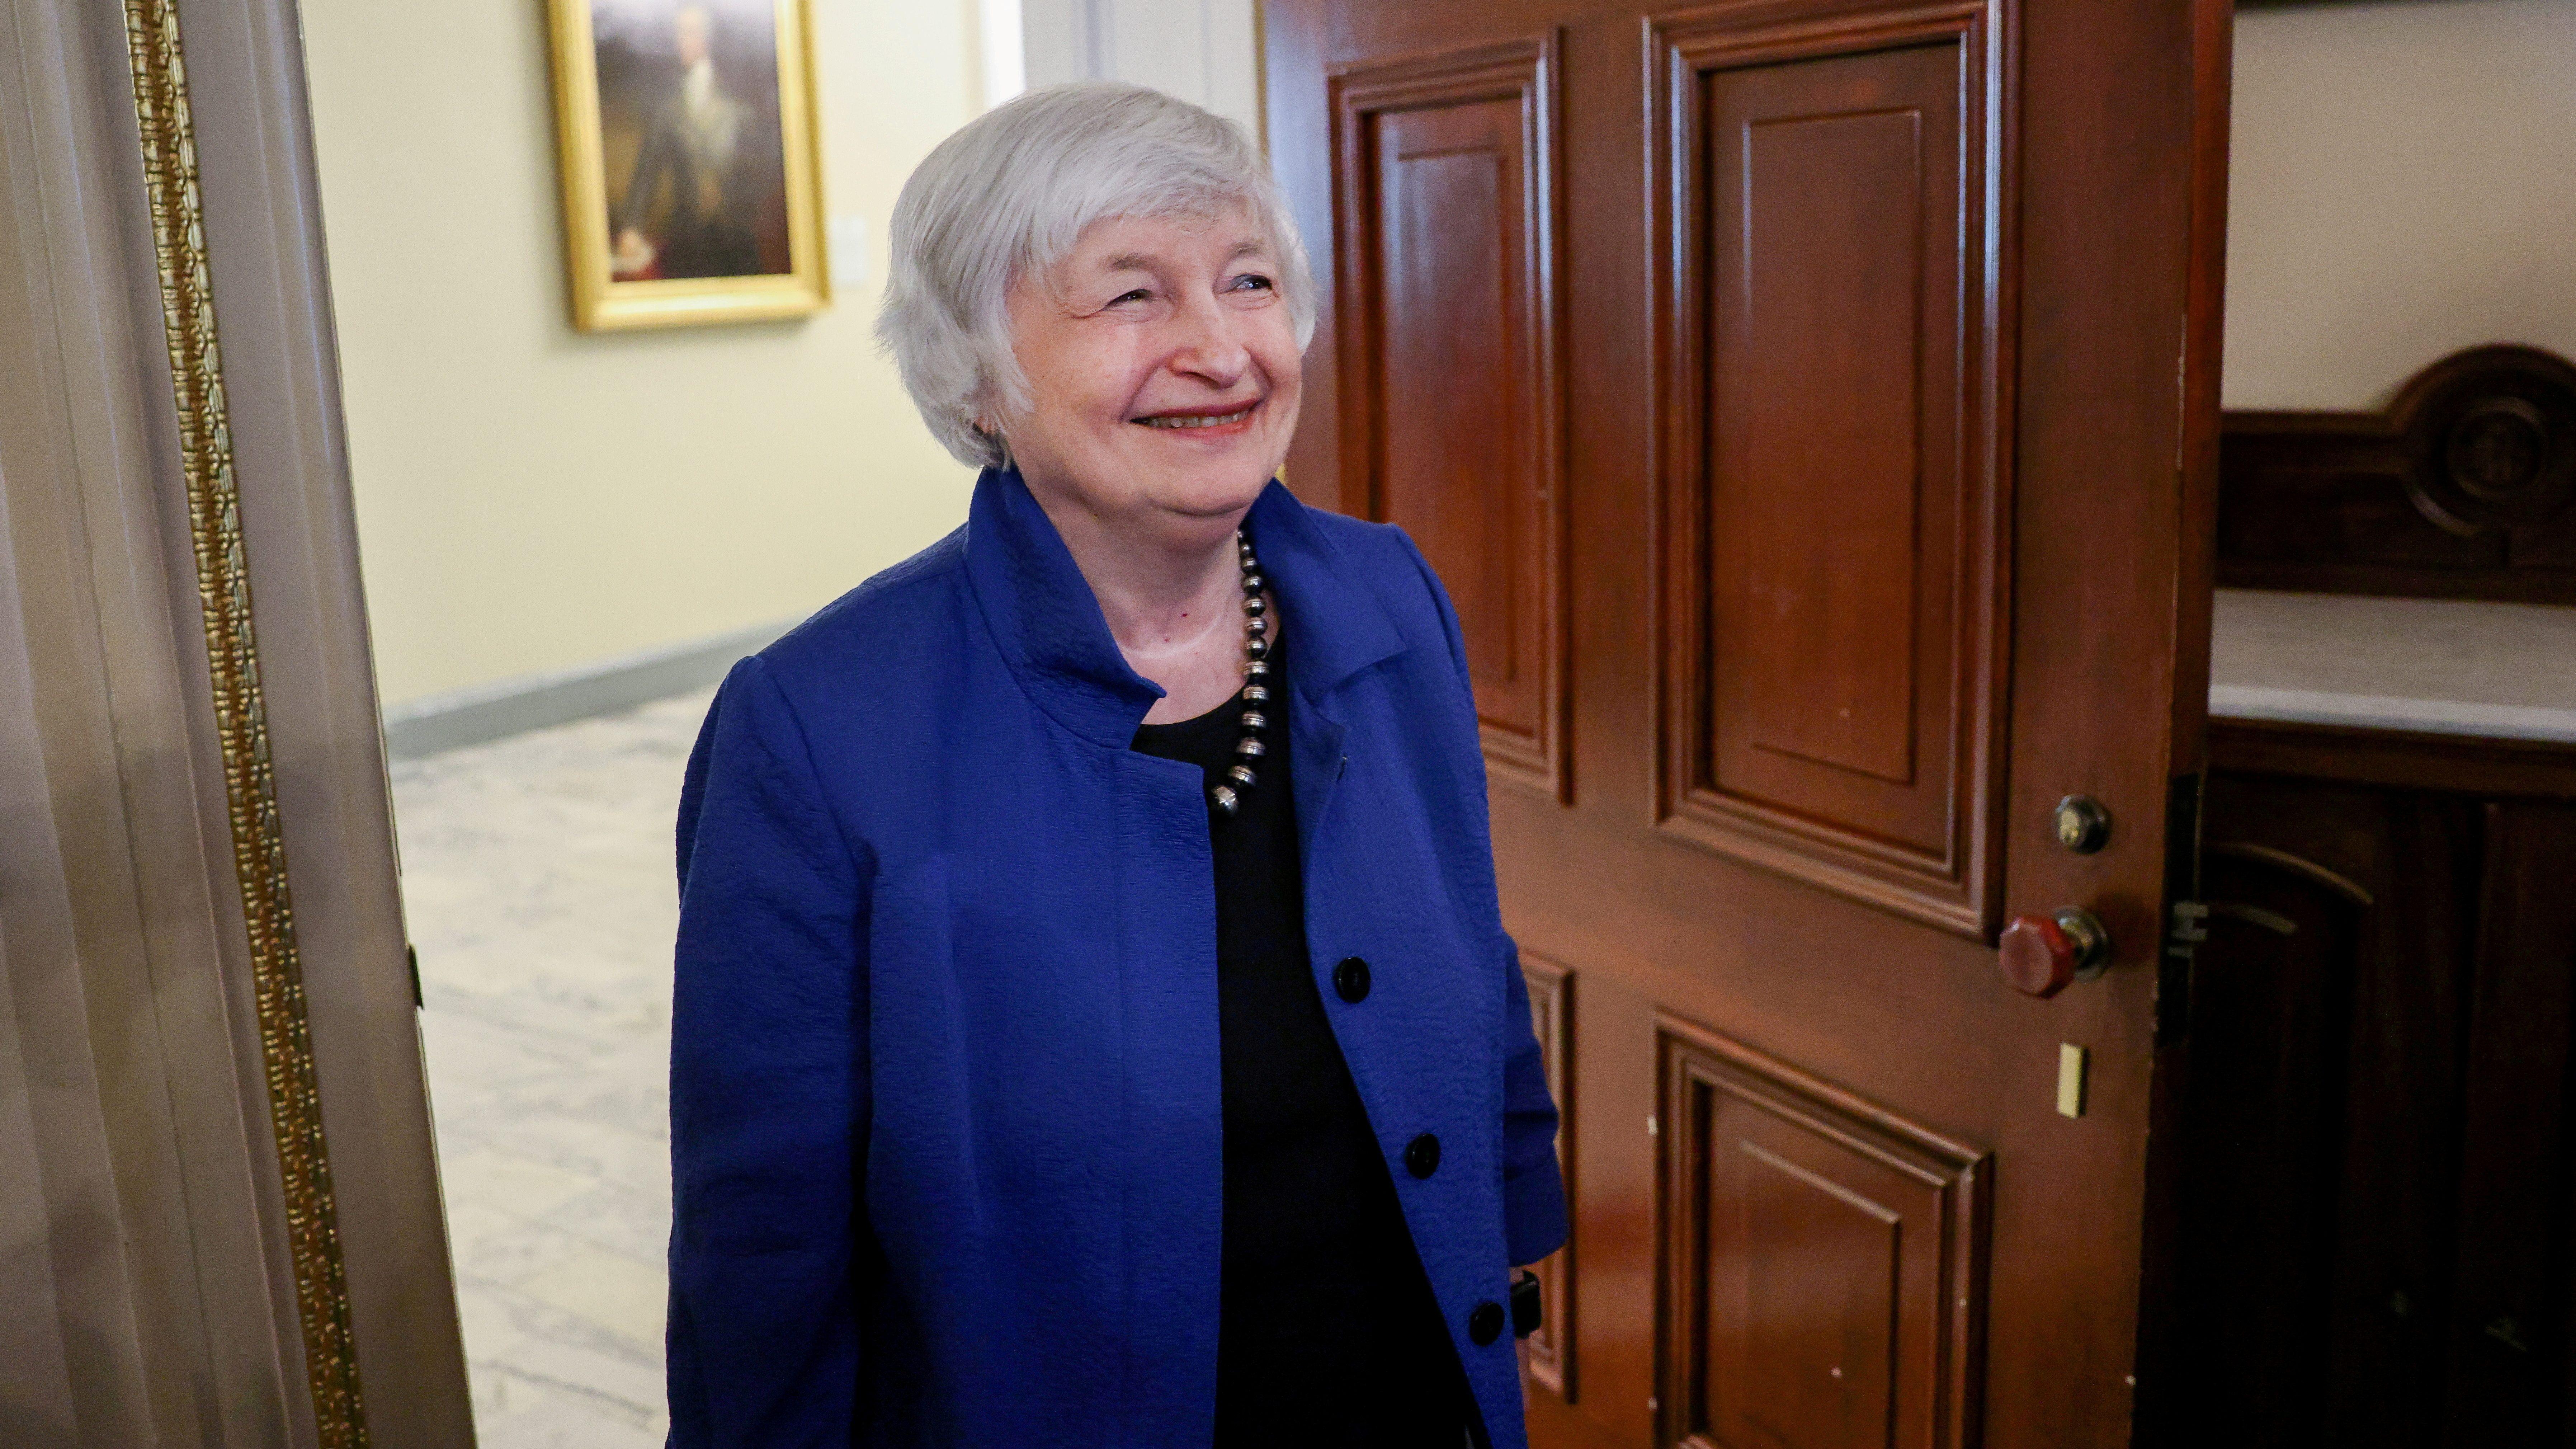 U.S. Secretary of the Treasury Janet Yellen